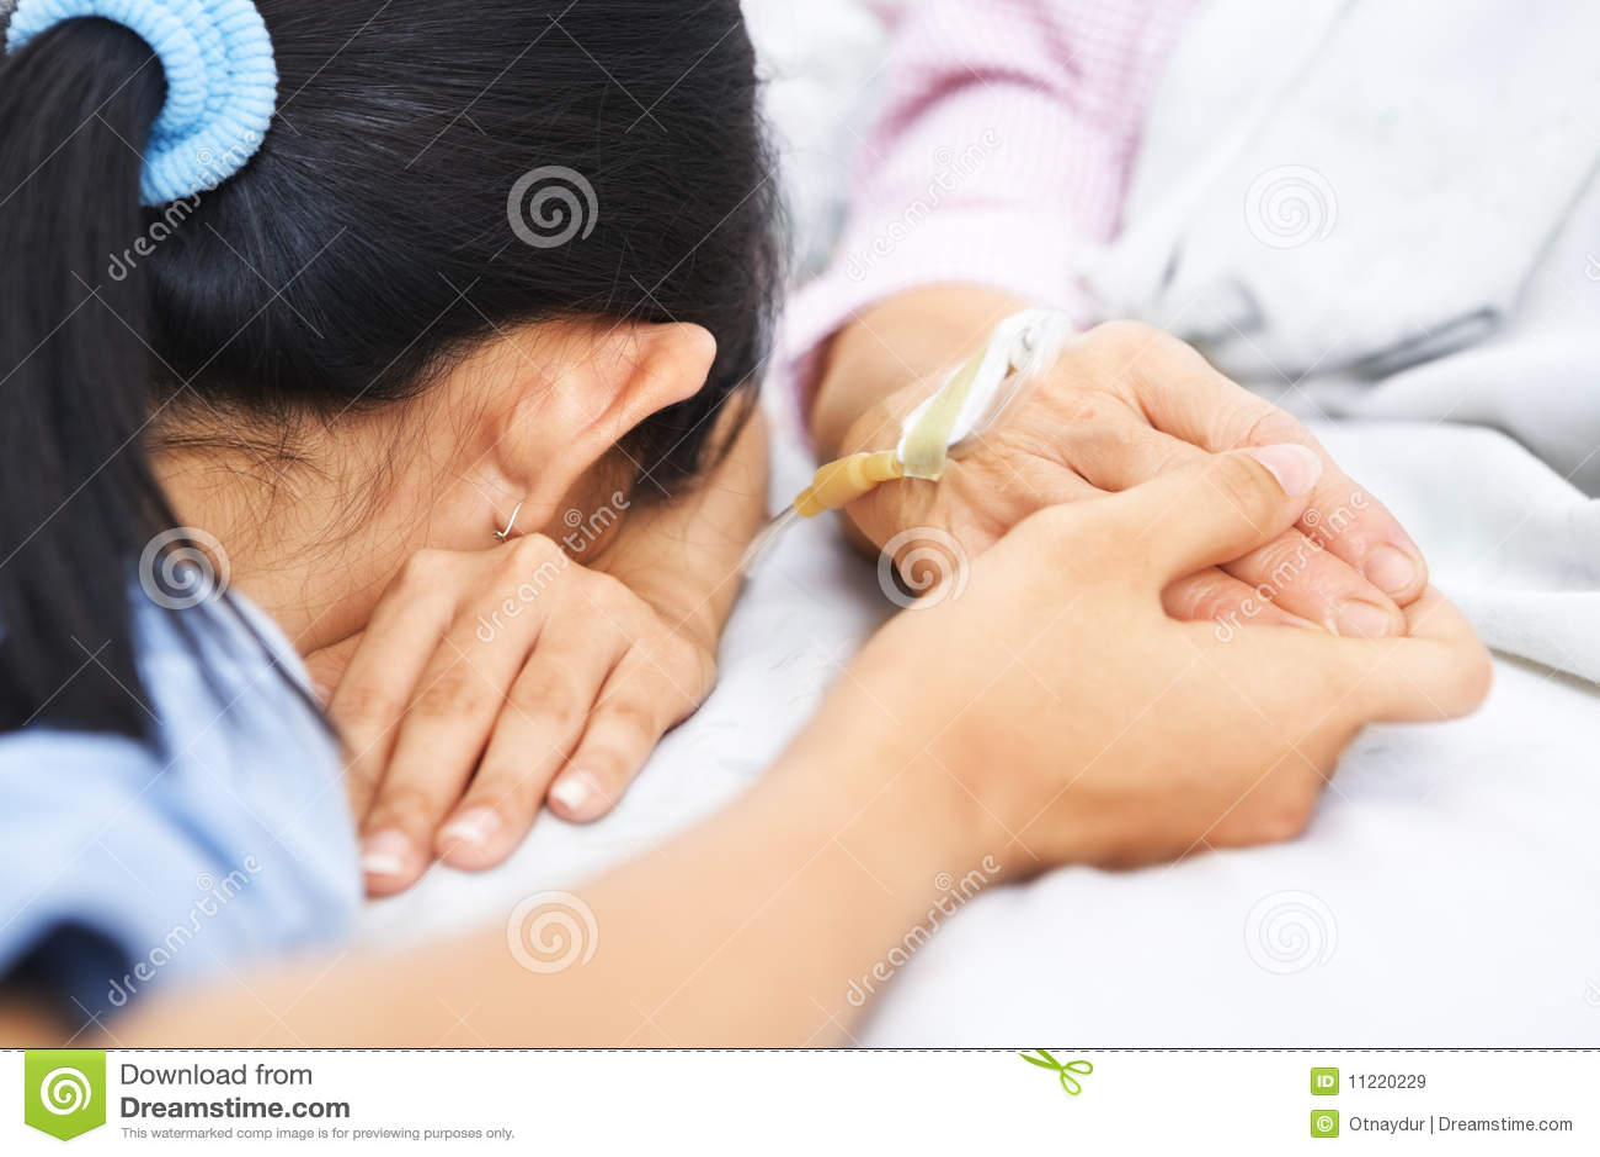 Daughter Fall Asleep Waiting Her Sick Mother Daughter Fall Asleep Waiting  Her Sick Mother Royalty Free